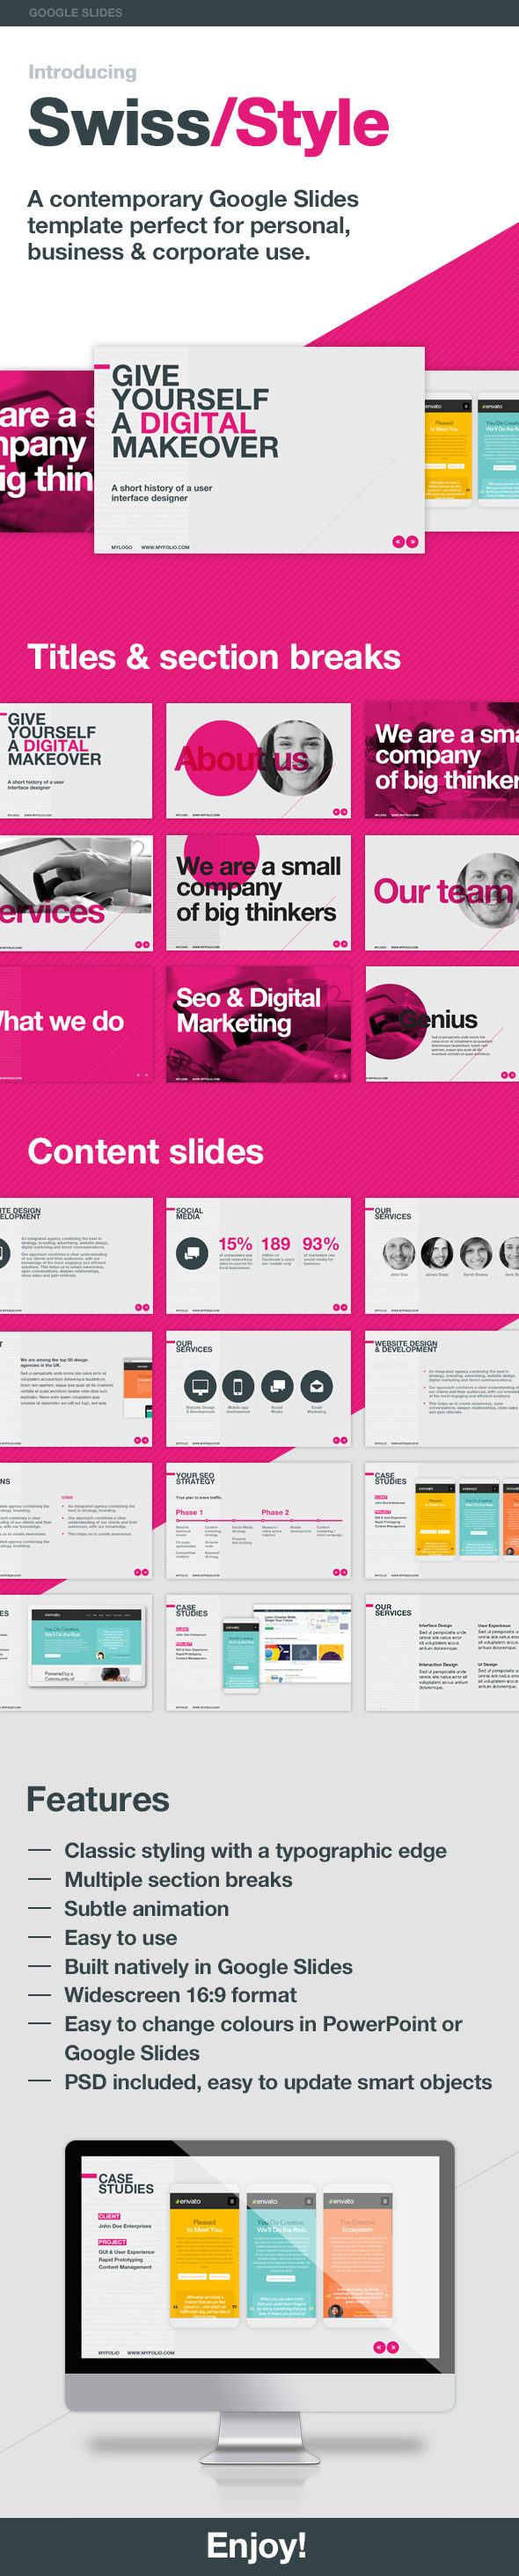 Swiss Style Google Slides Template - Google Slides Presentation Templates